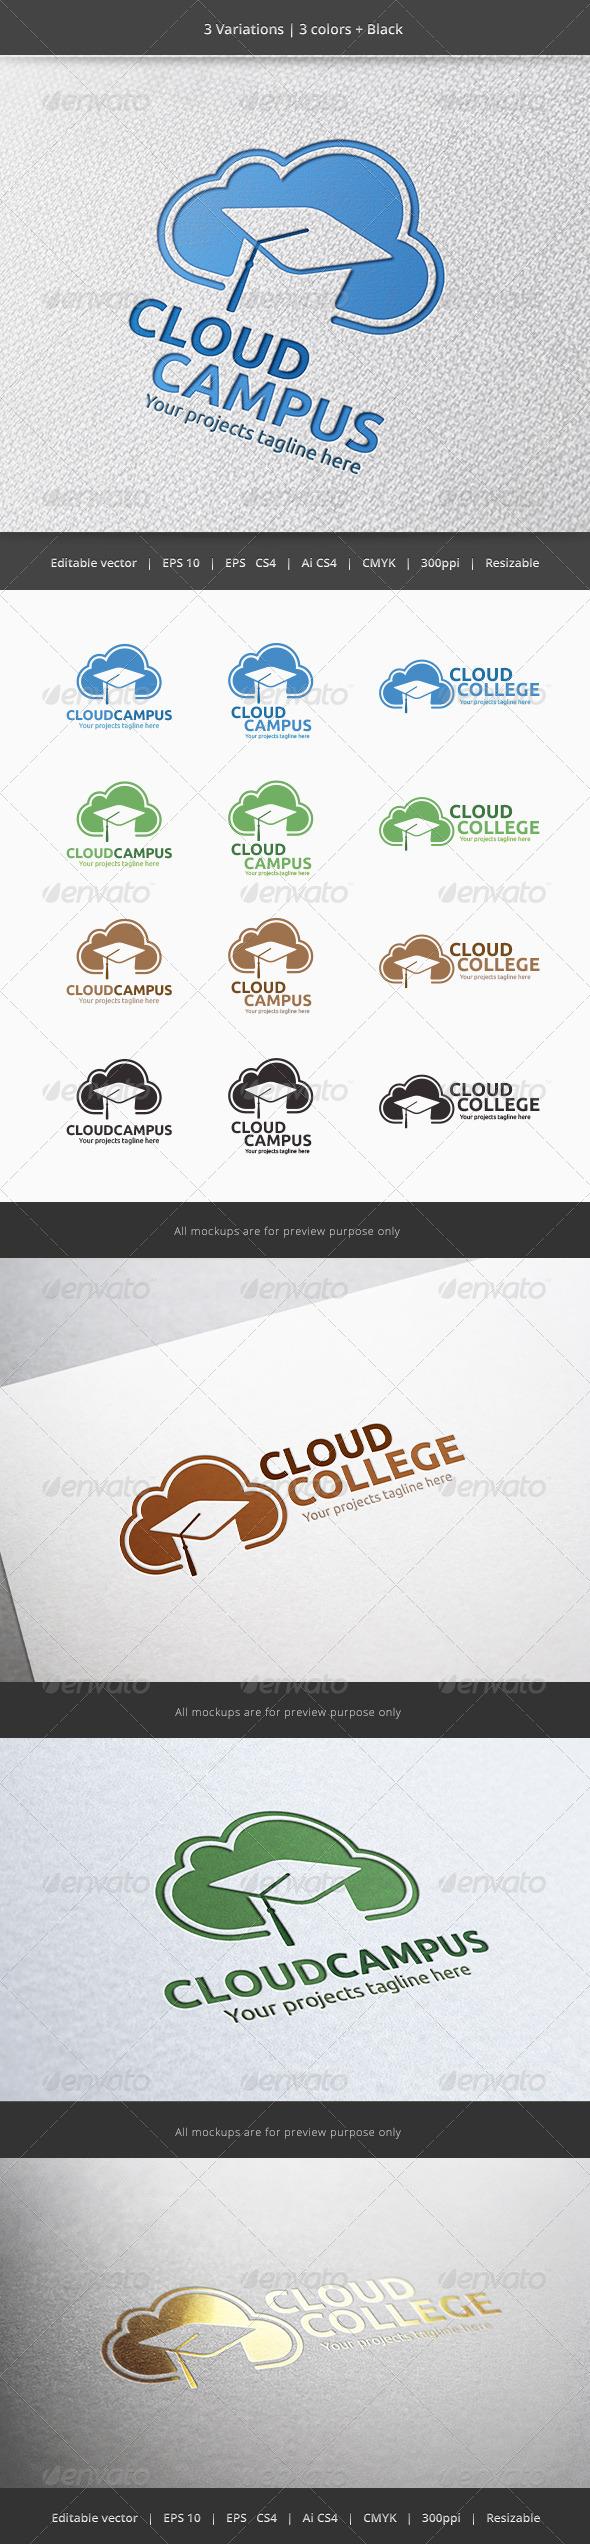 GraphicRiver Cloud Campus Logo 5924409